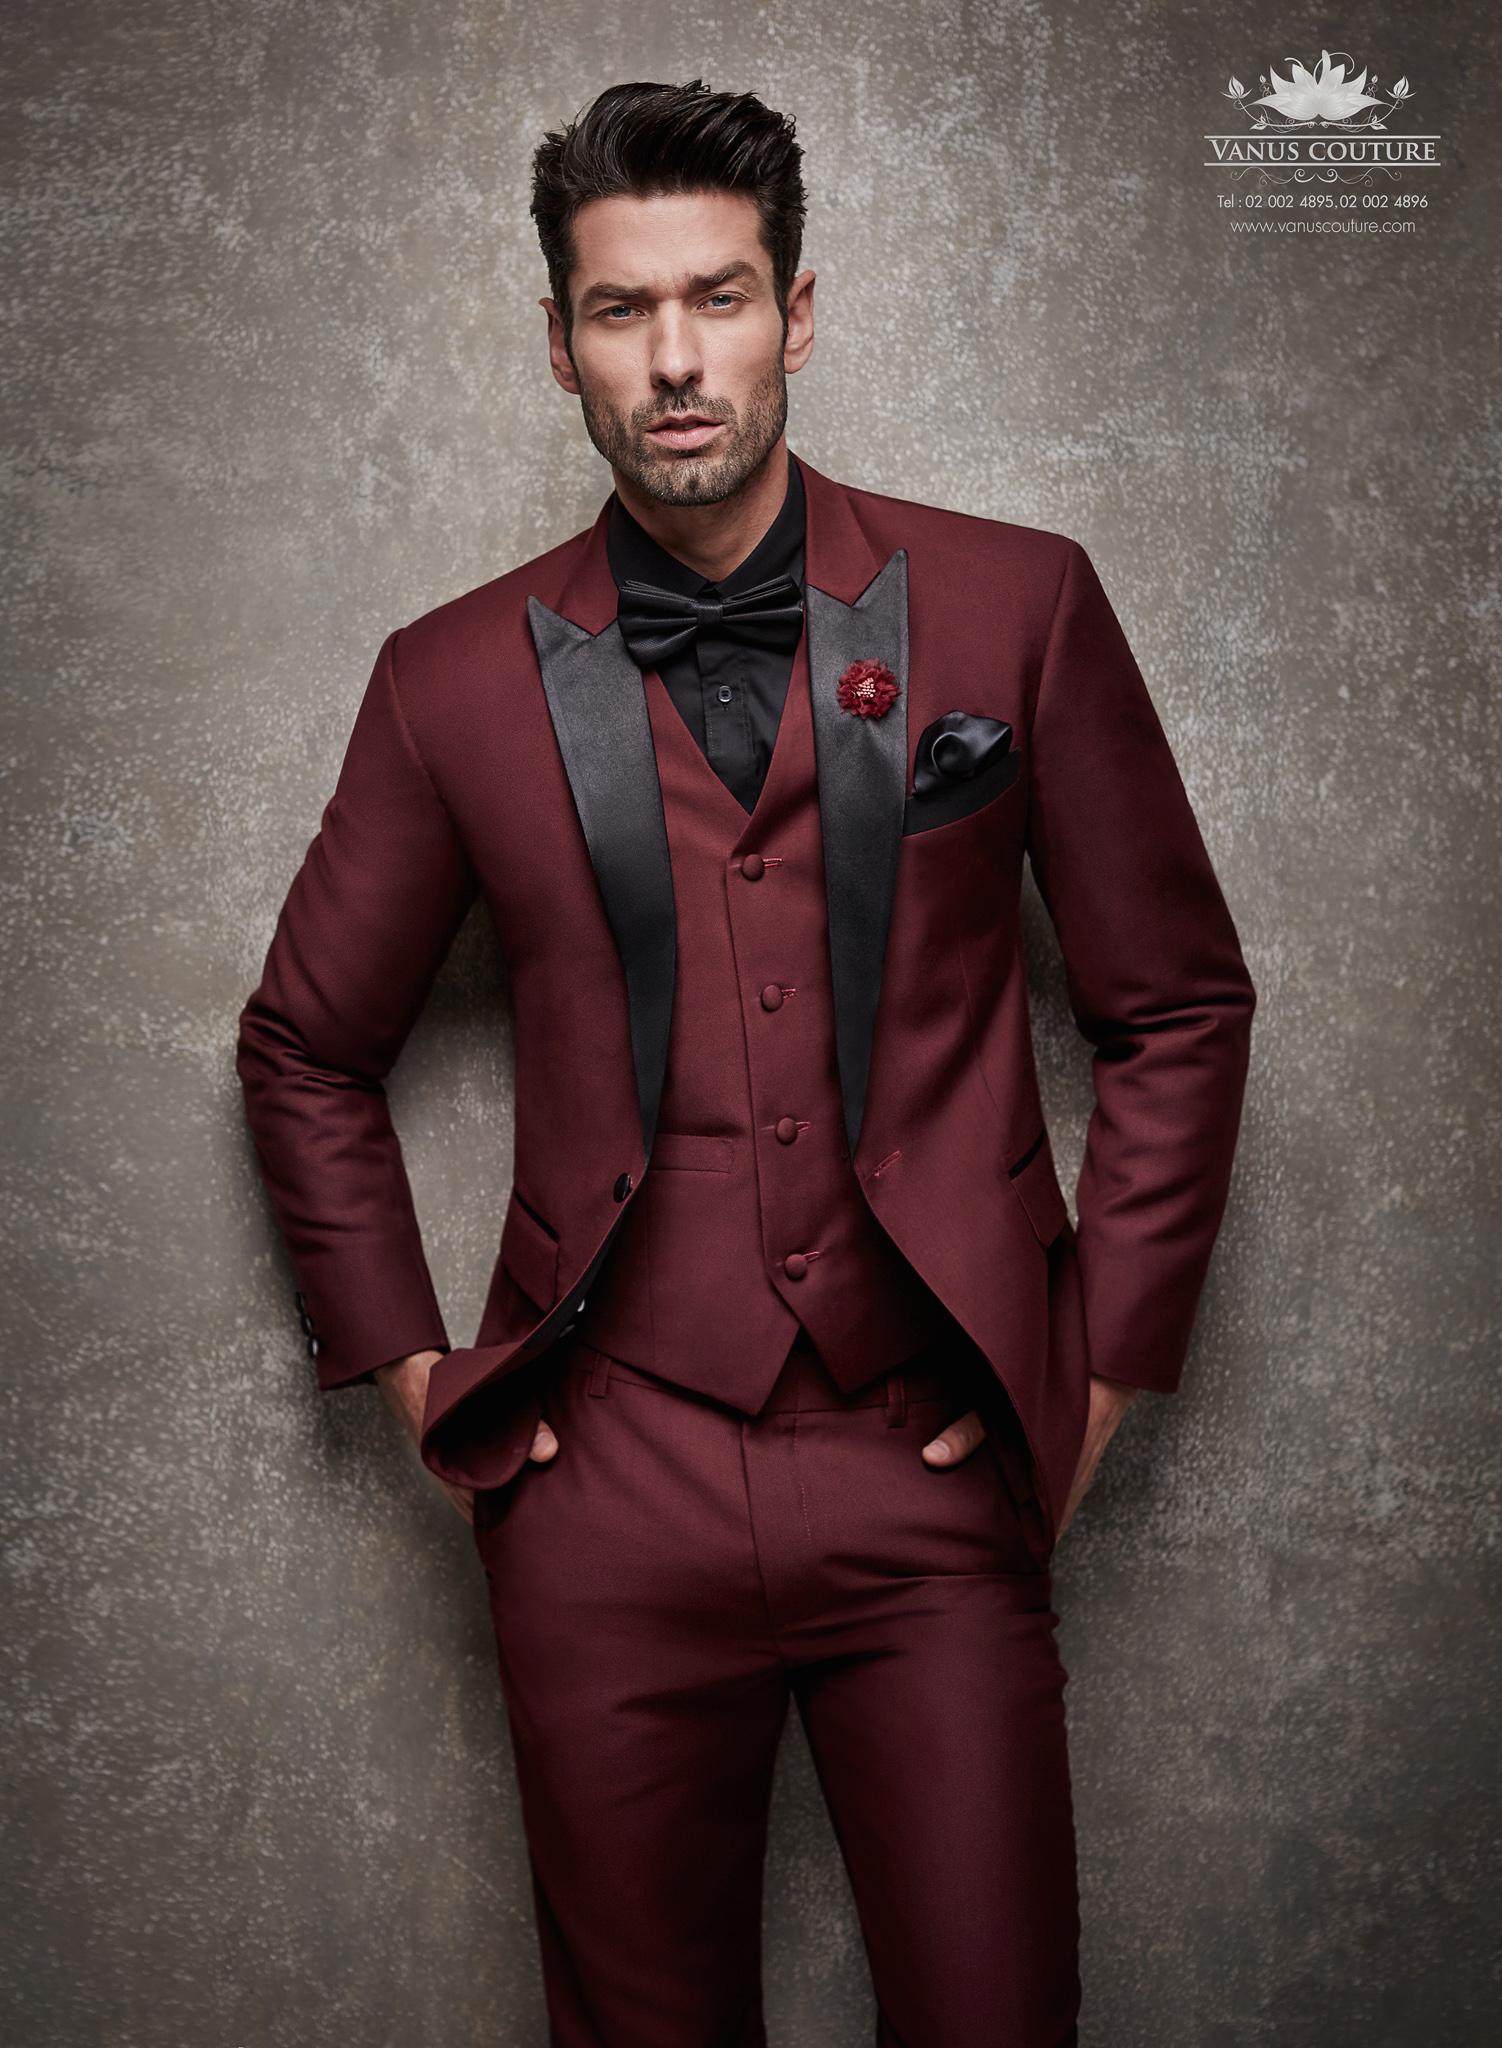 Groom suit - Justin 06